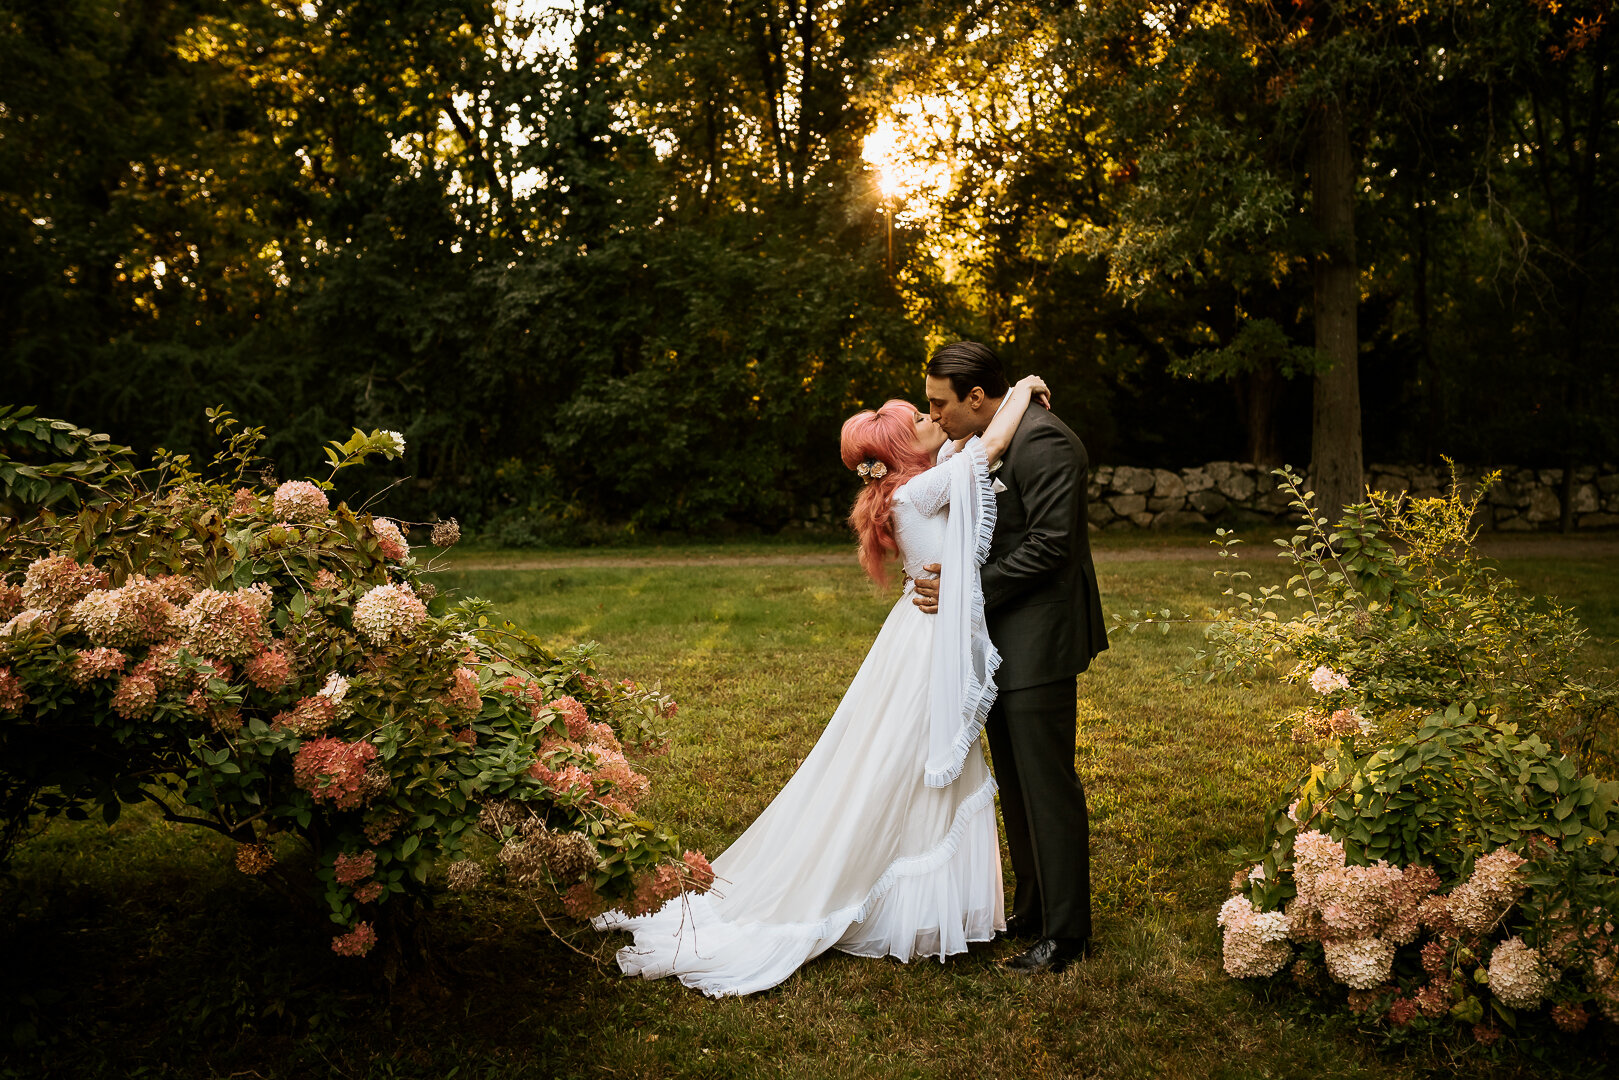 WEDDING PHOTOGRAPHY STARTING AT $2000 / WEDDING VIDEOGRAPHY STARTING AT $1600